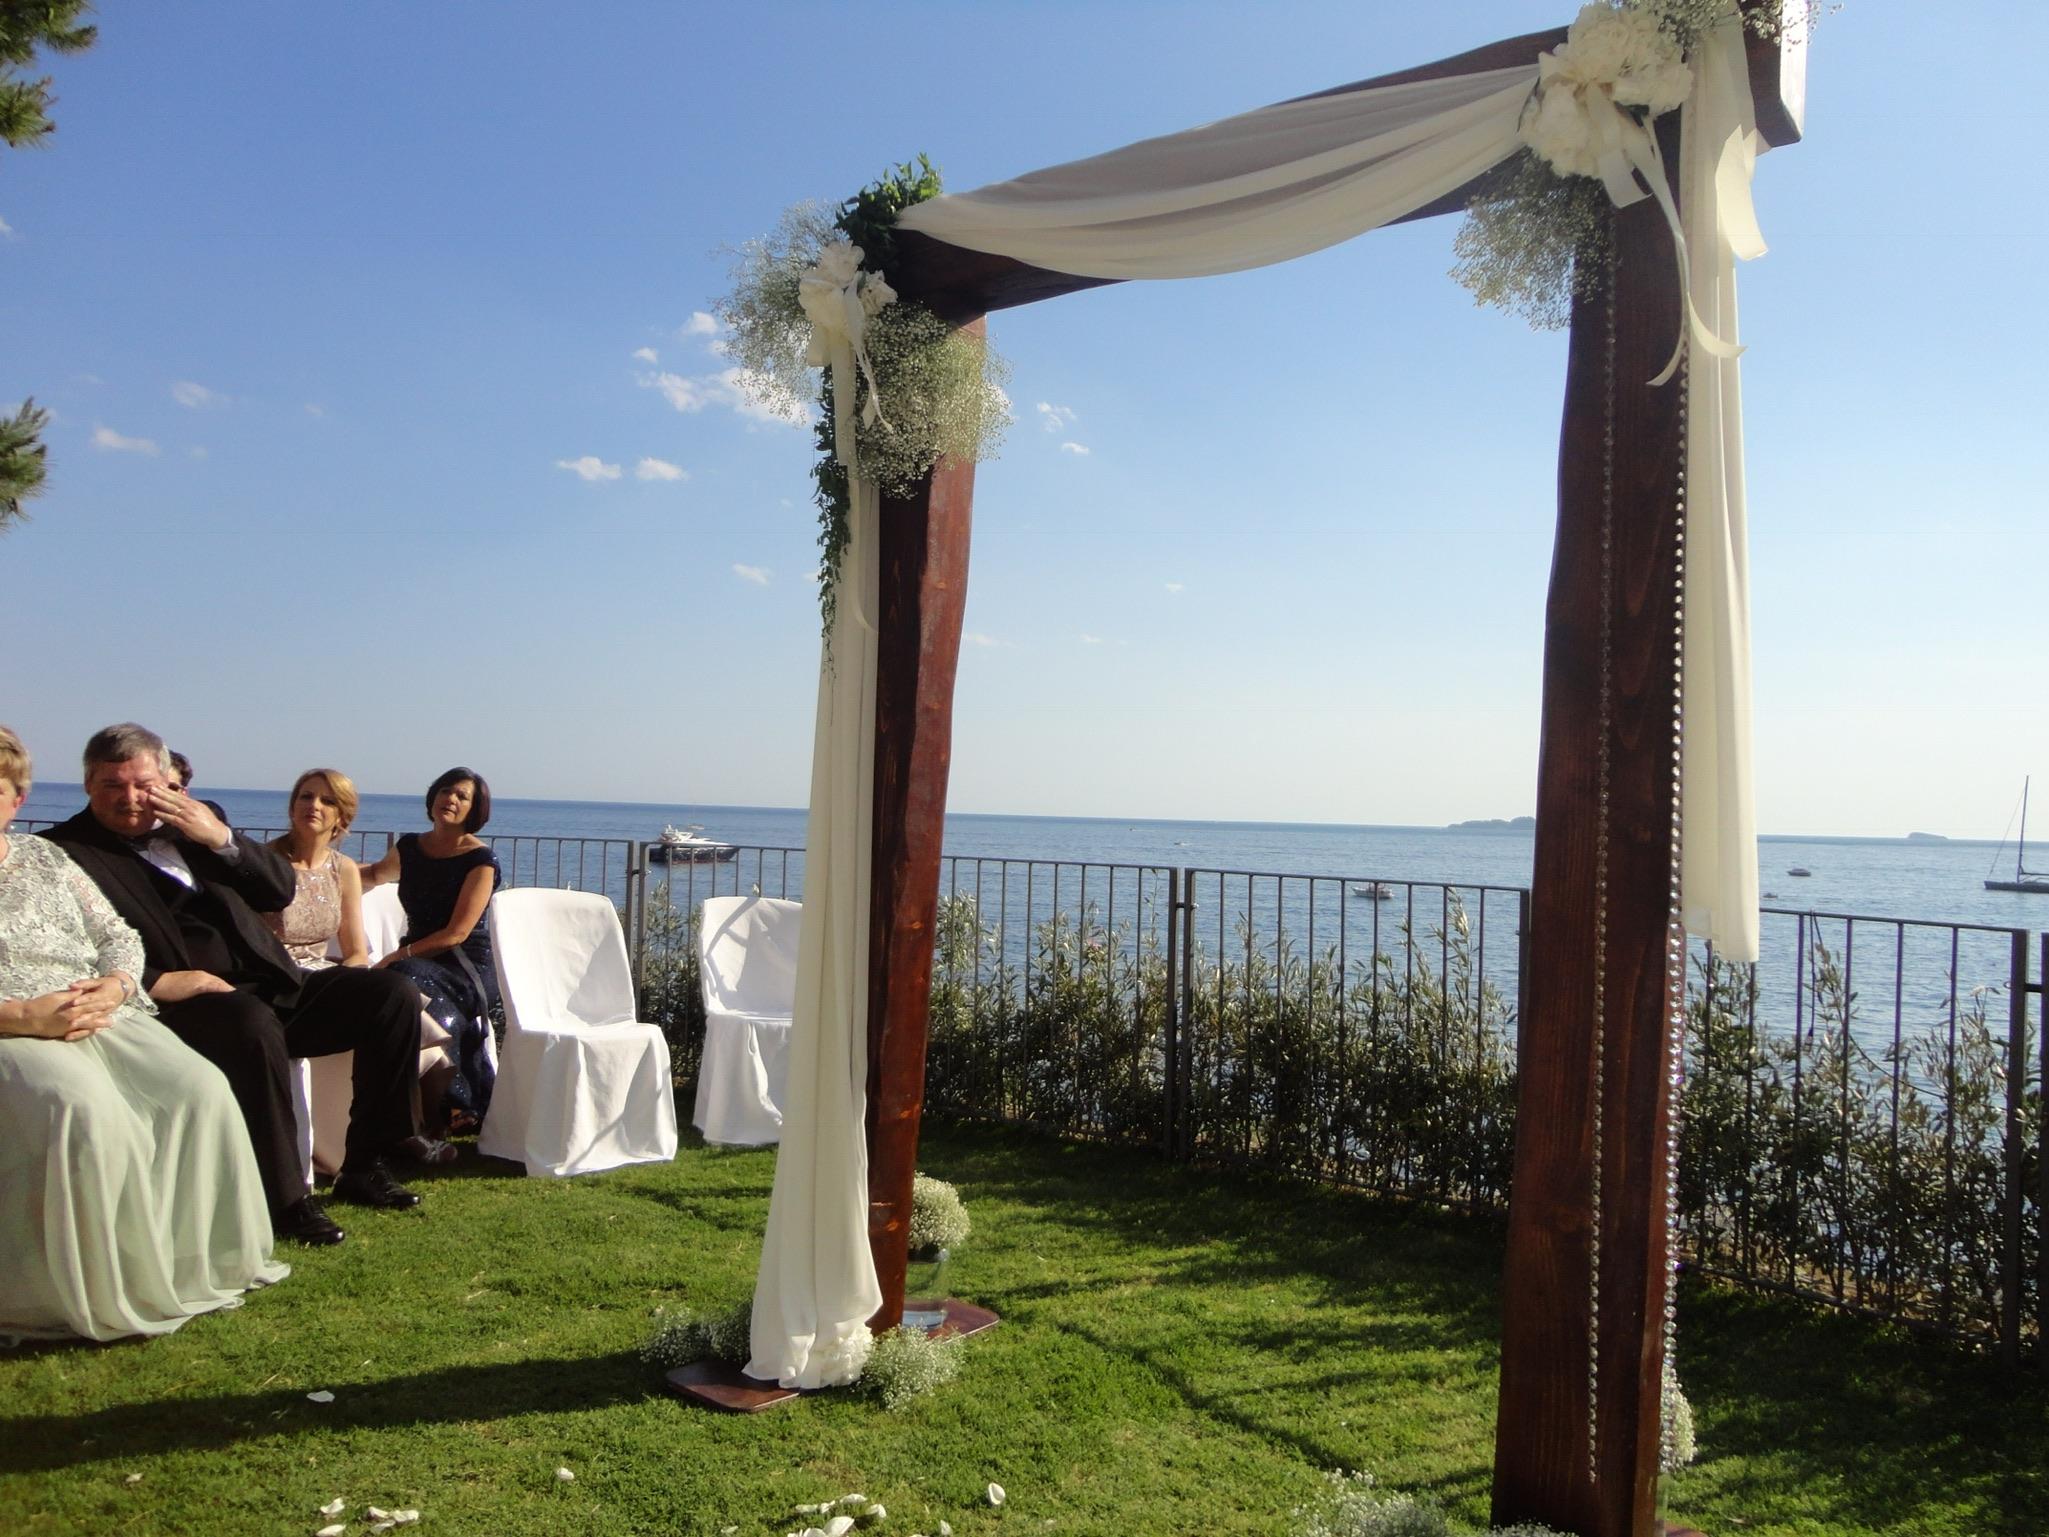 http://www.weddingamalfi.com/wp-content/uploads/Nathalie-and-Benjamin-wedding-in-Positano-32.jpg